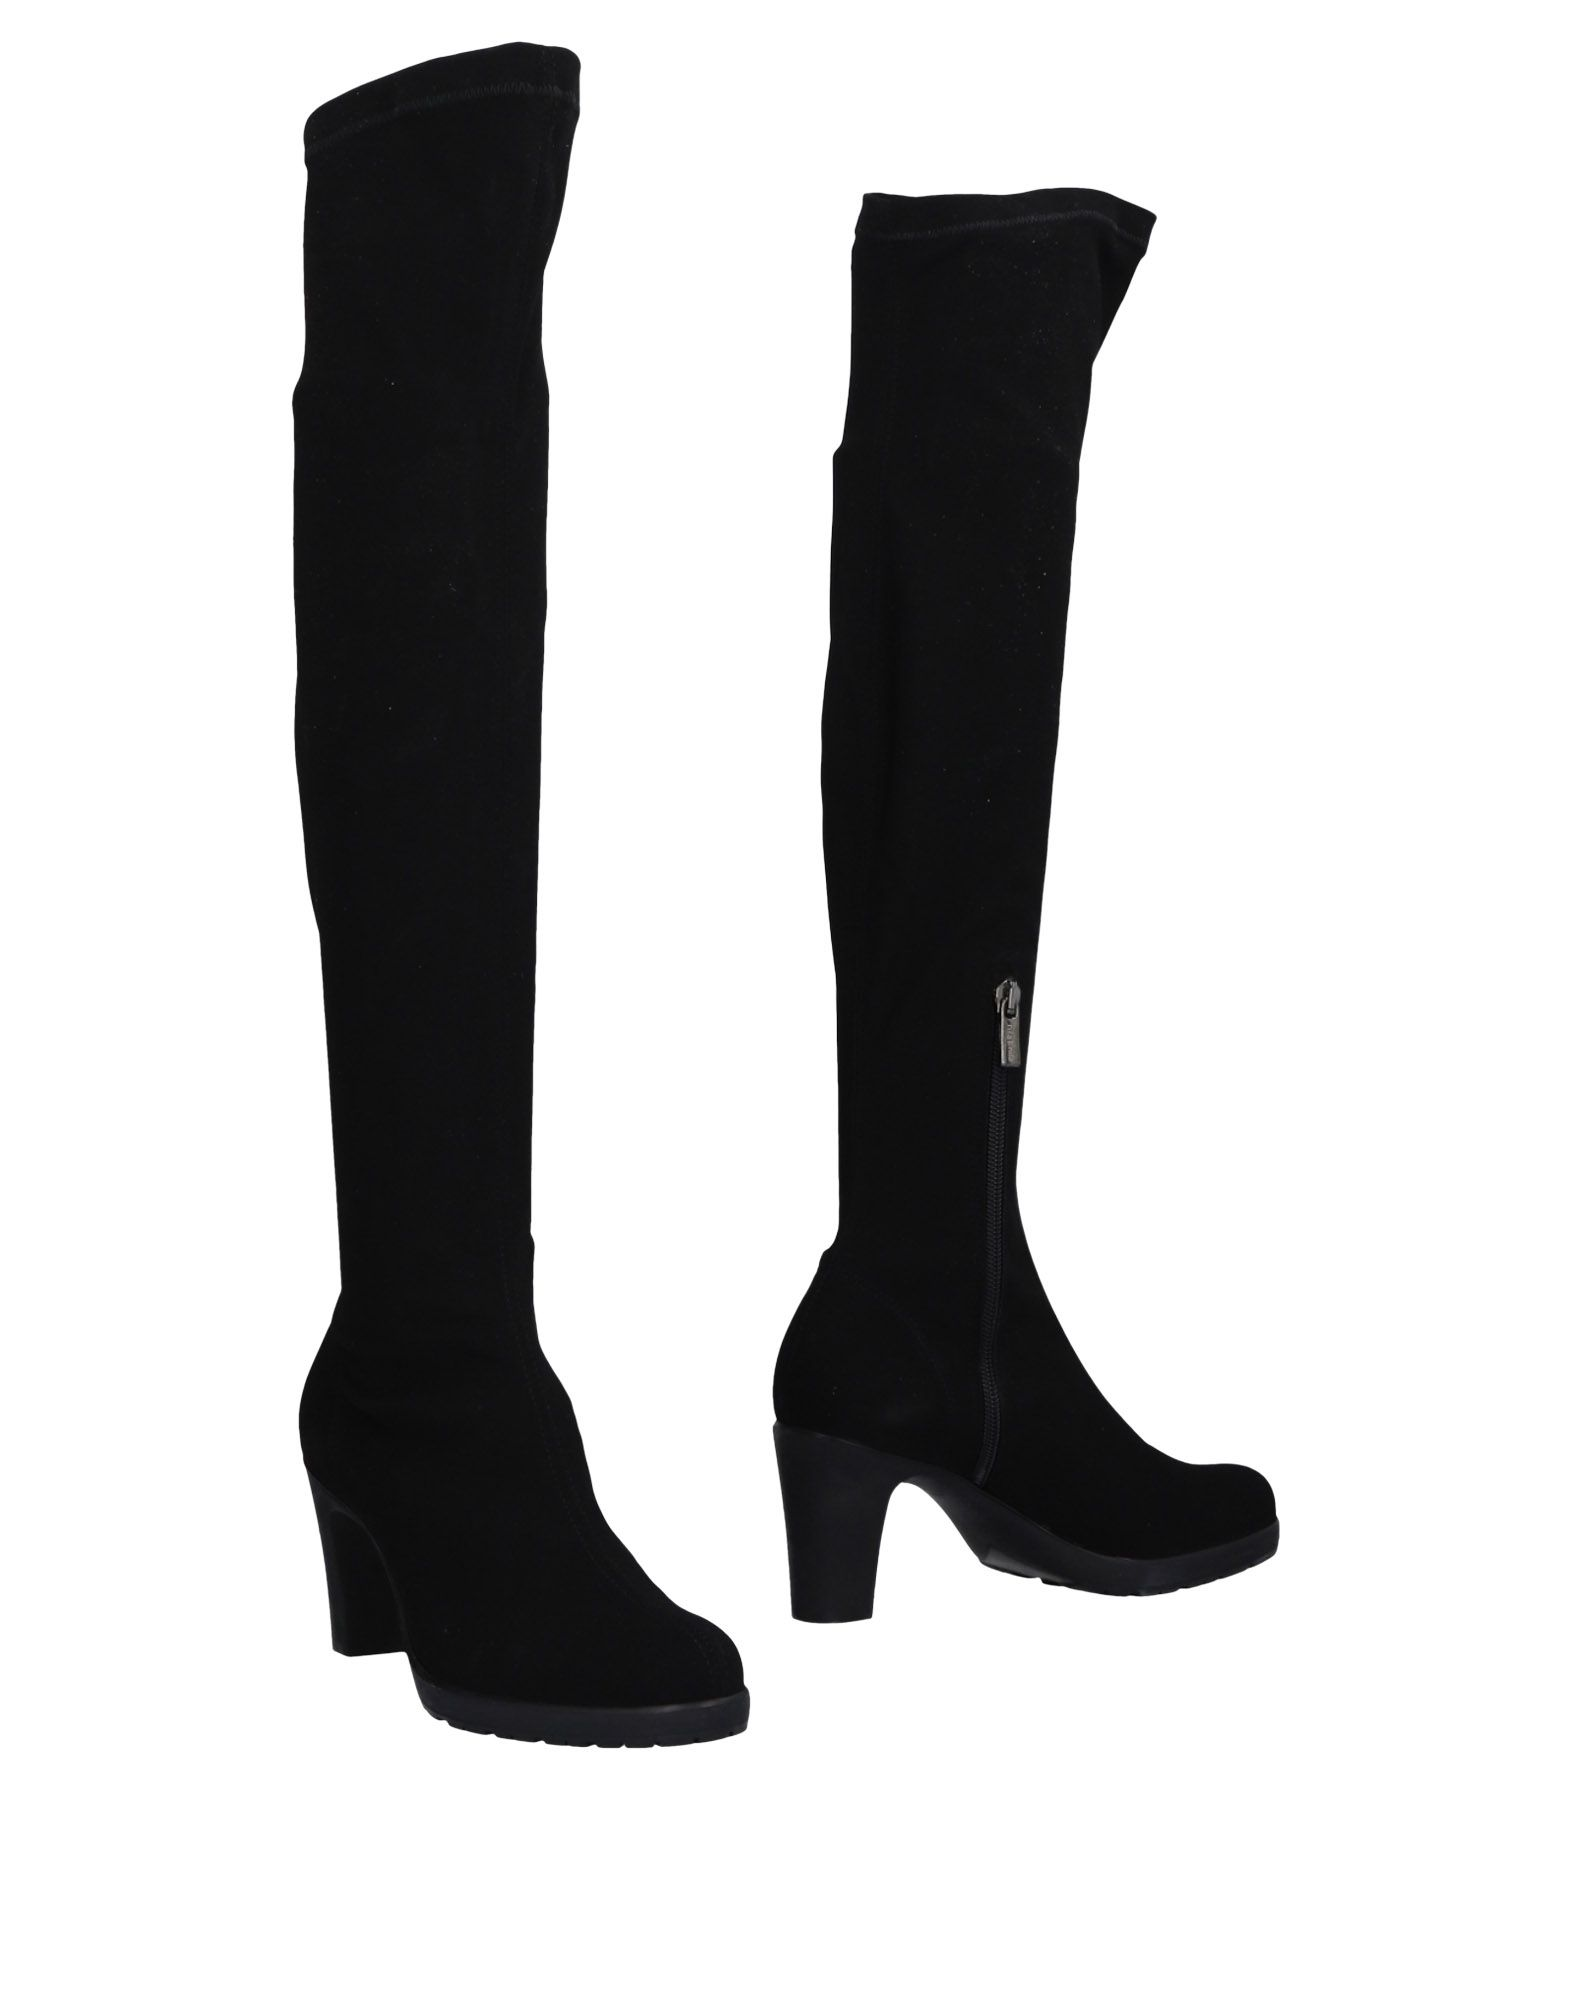 Nila & Nila Stiefelette Qualität Damen  11476803QE Gute Qualität Stiefelette beliebte Schuhe 12ec68